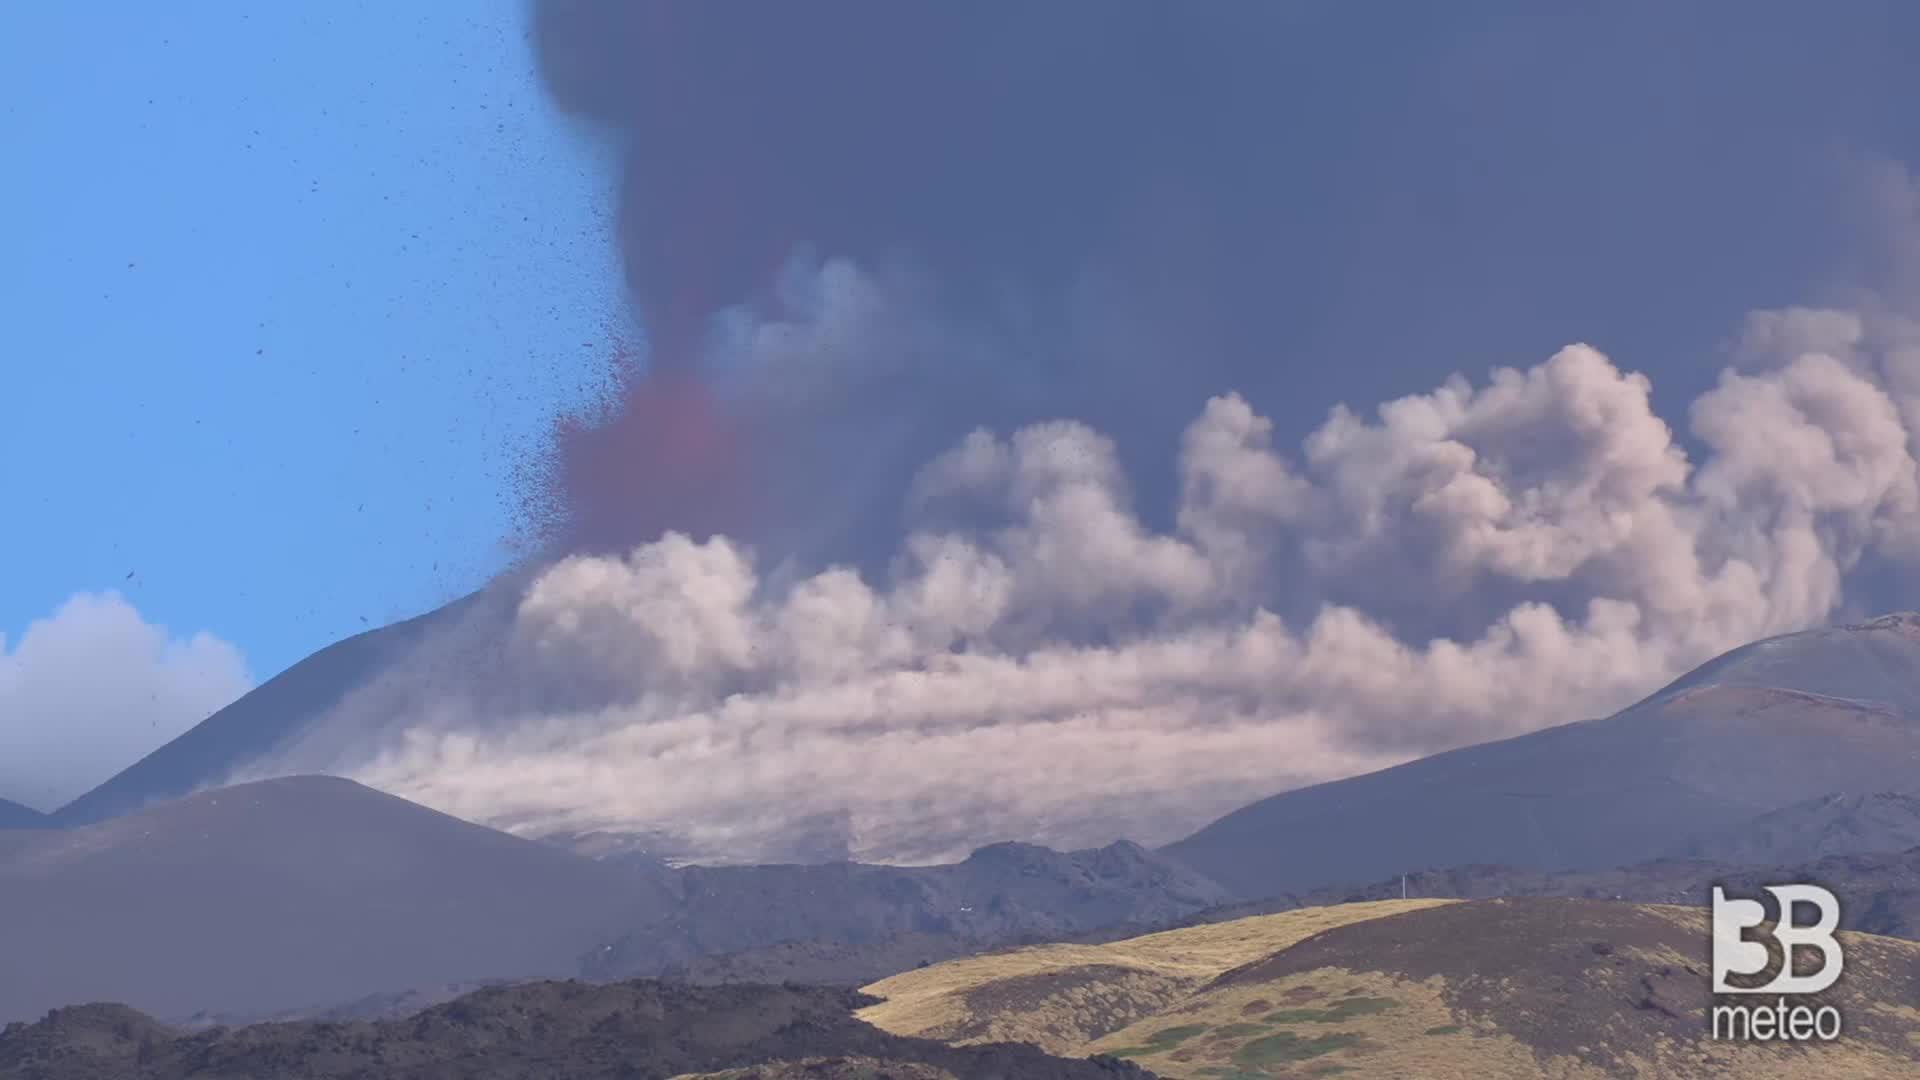 CRONACA DIRETTA - Etna, nuova eruzione: ripresa attività dal Cratere sudest - VIDEO